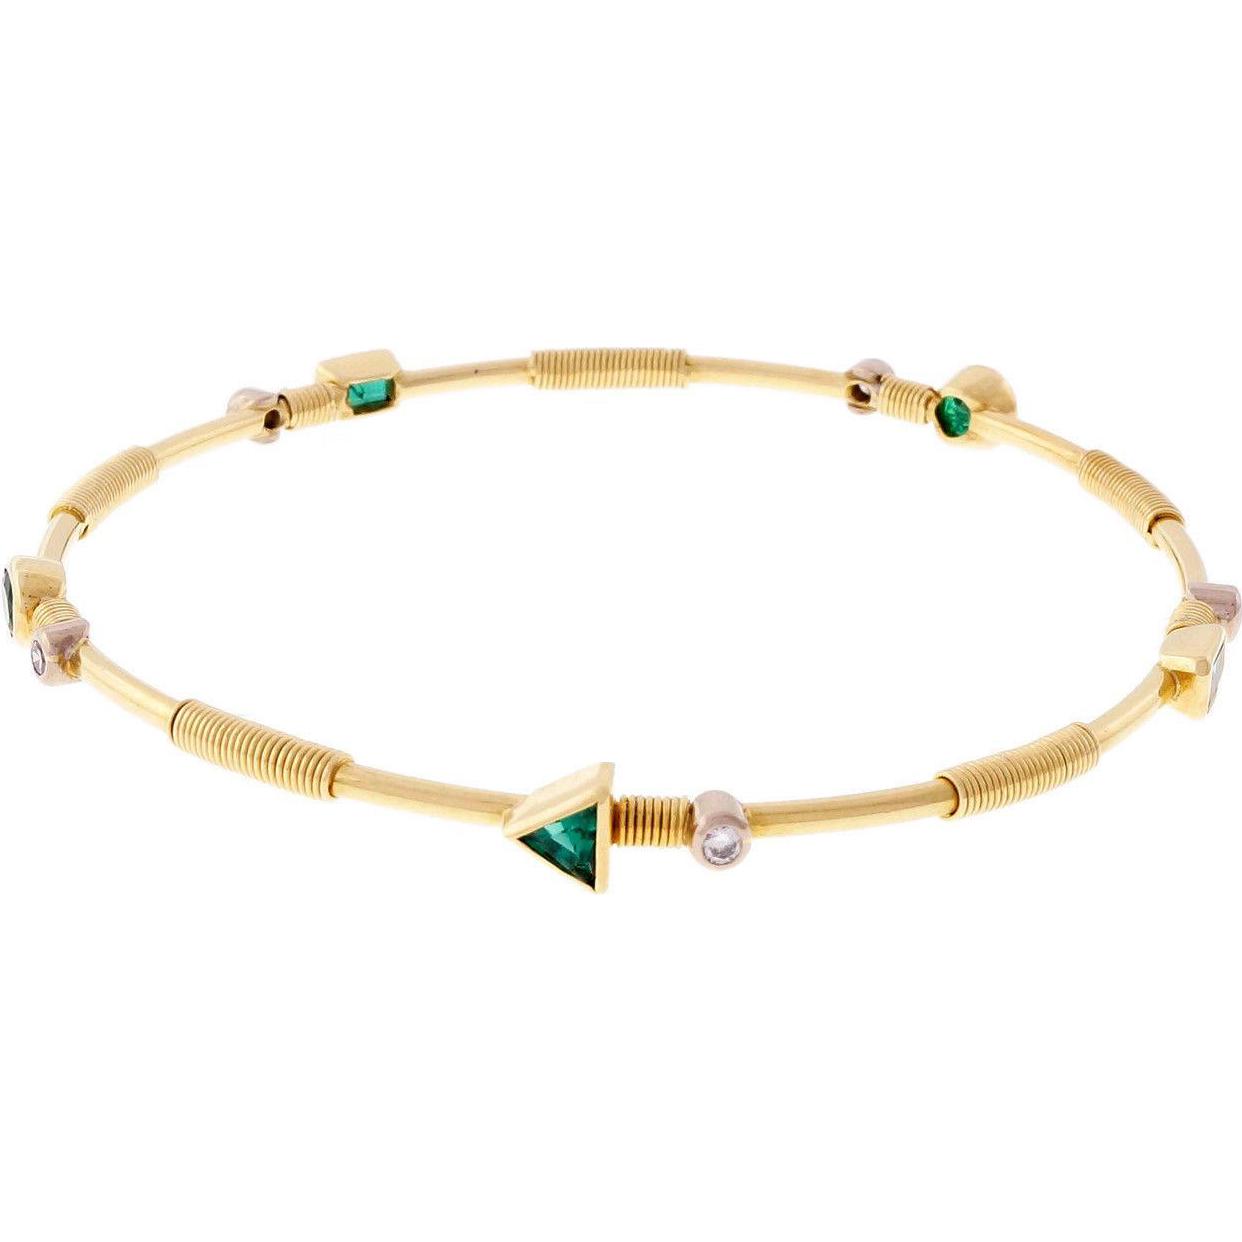 Emerald Diamond 18 Karat Yellow Gold Slip On Bangle Bracelet